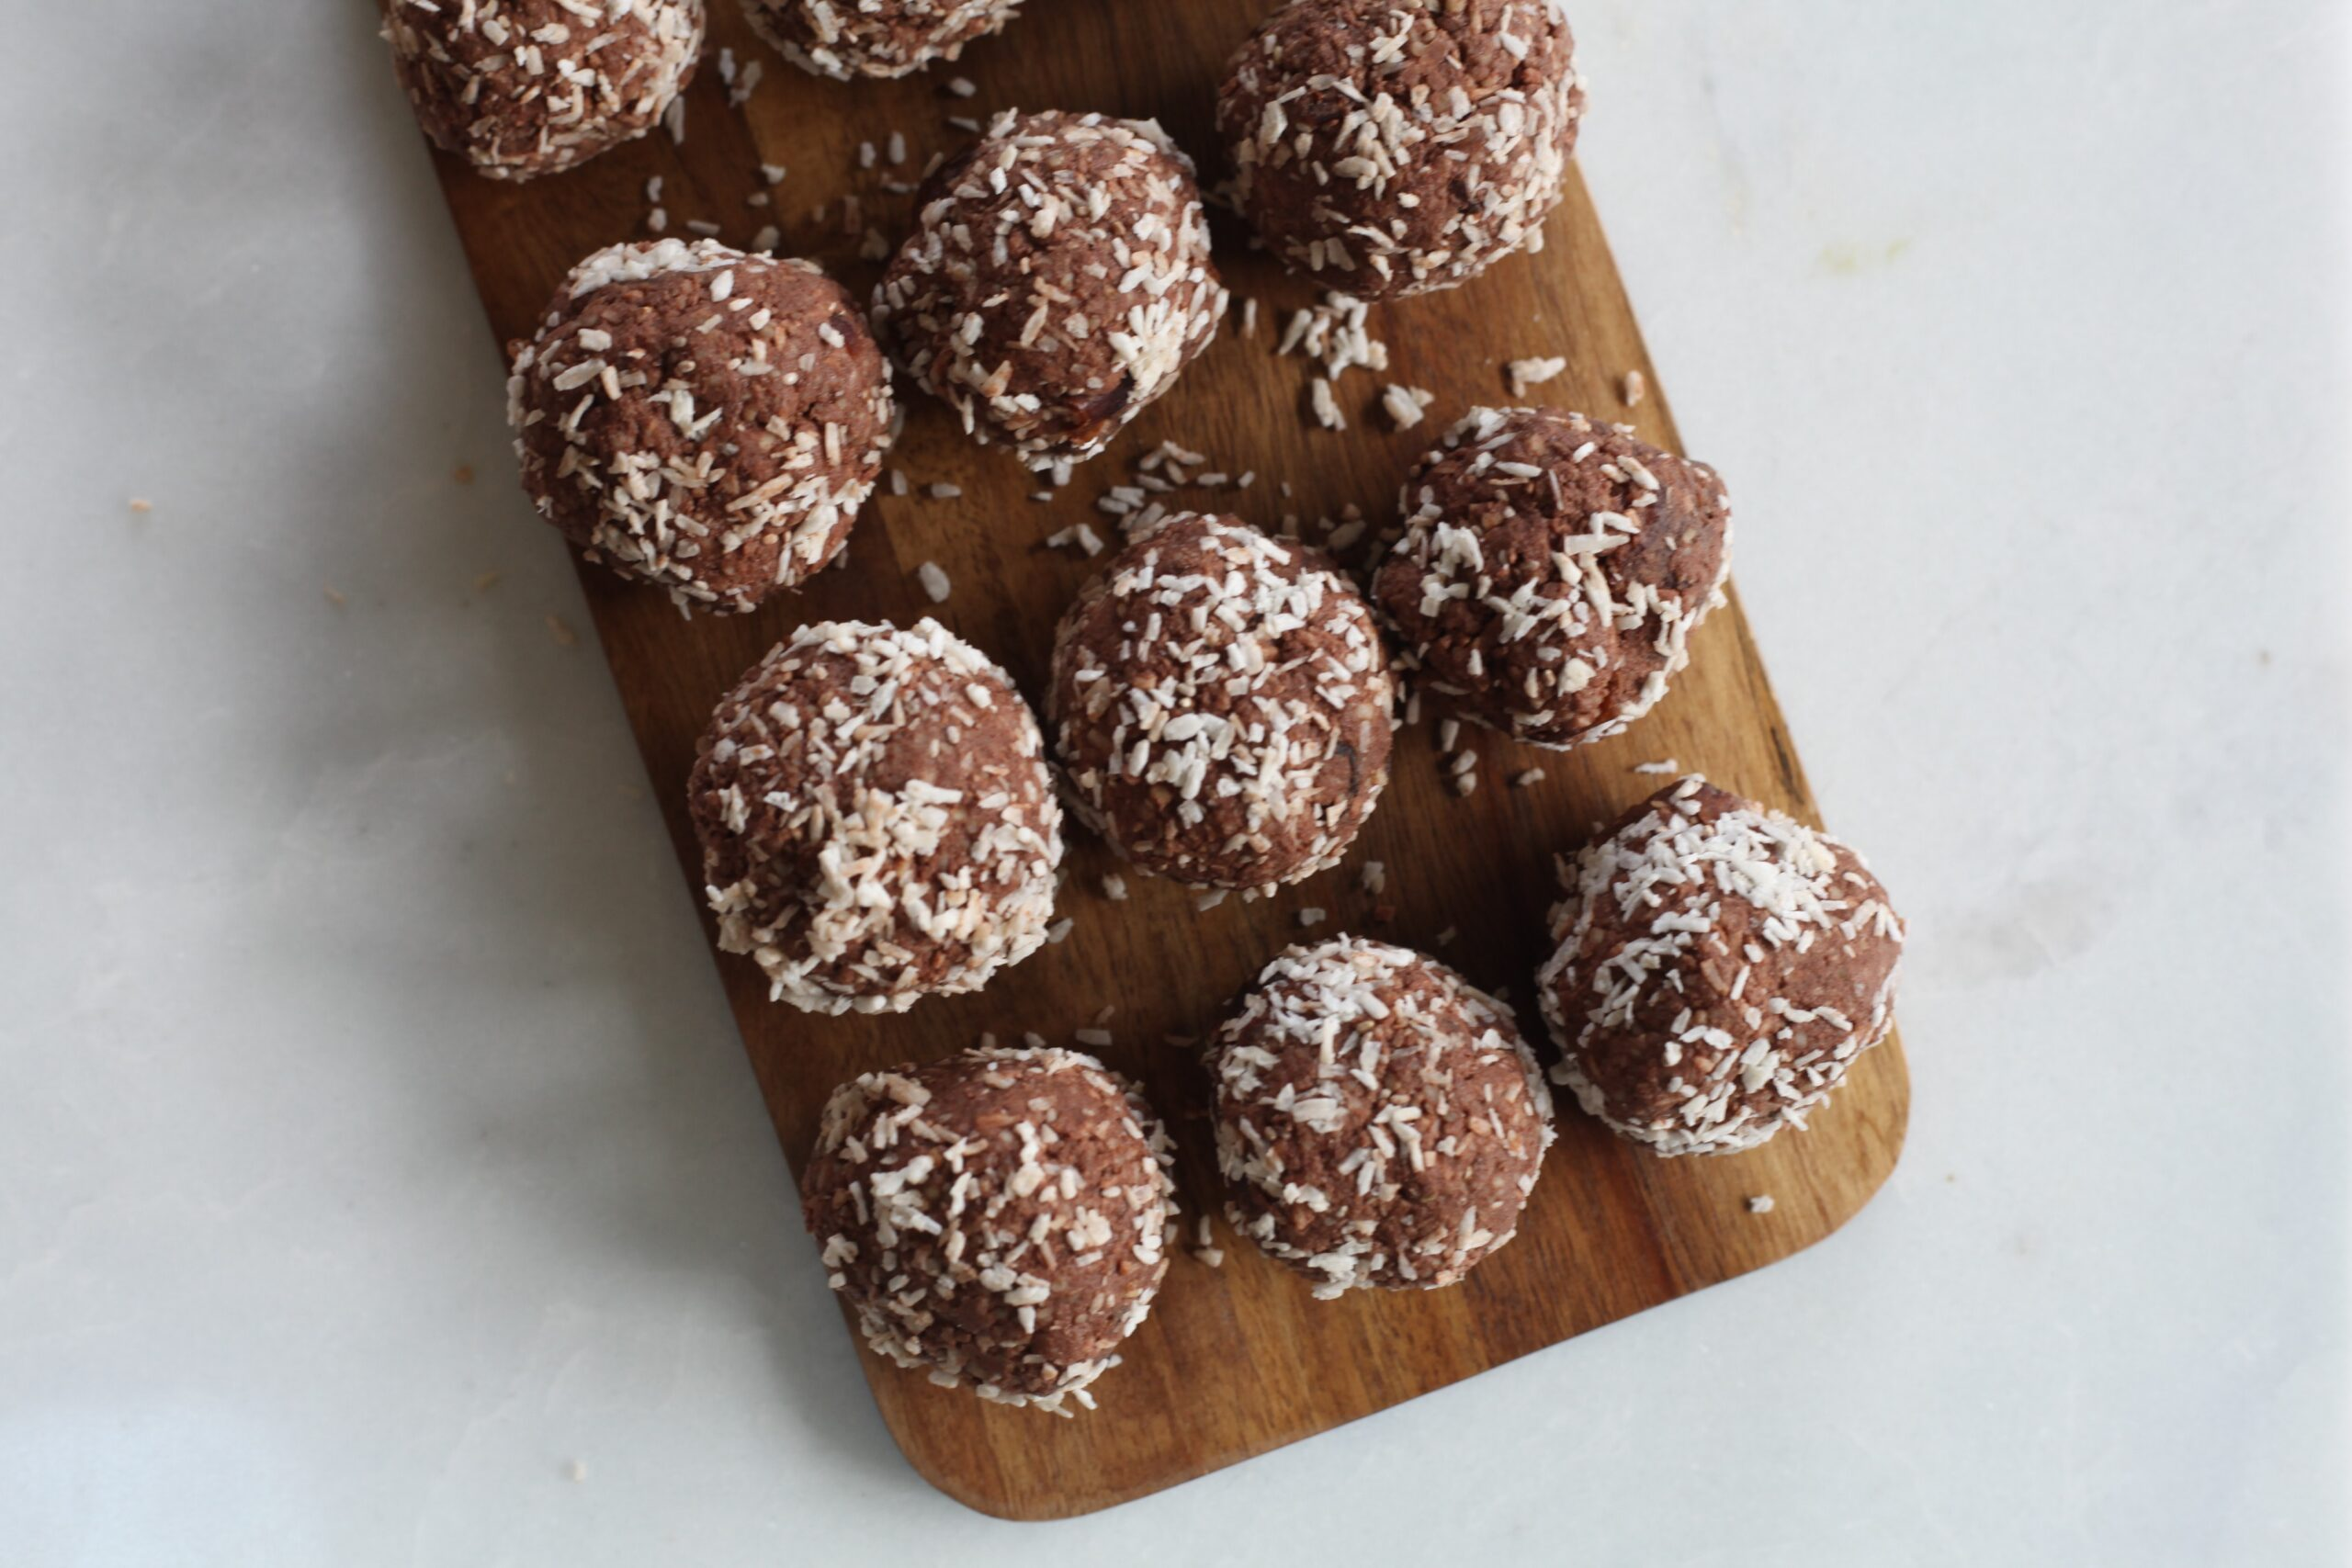 Festive chocolate balls